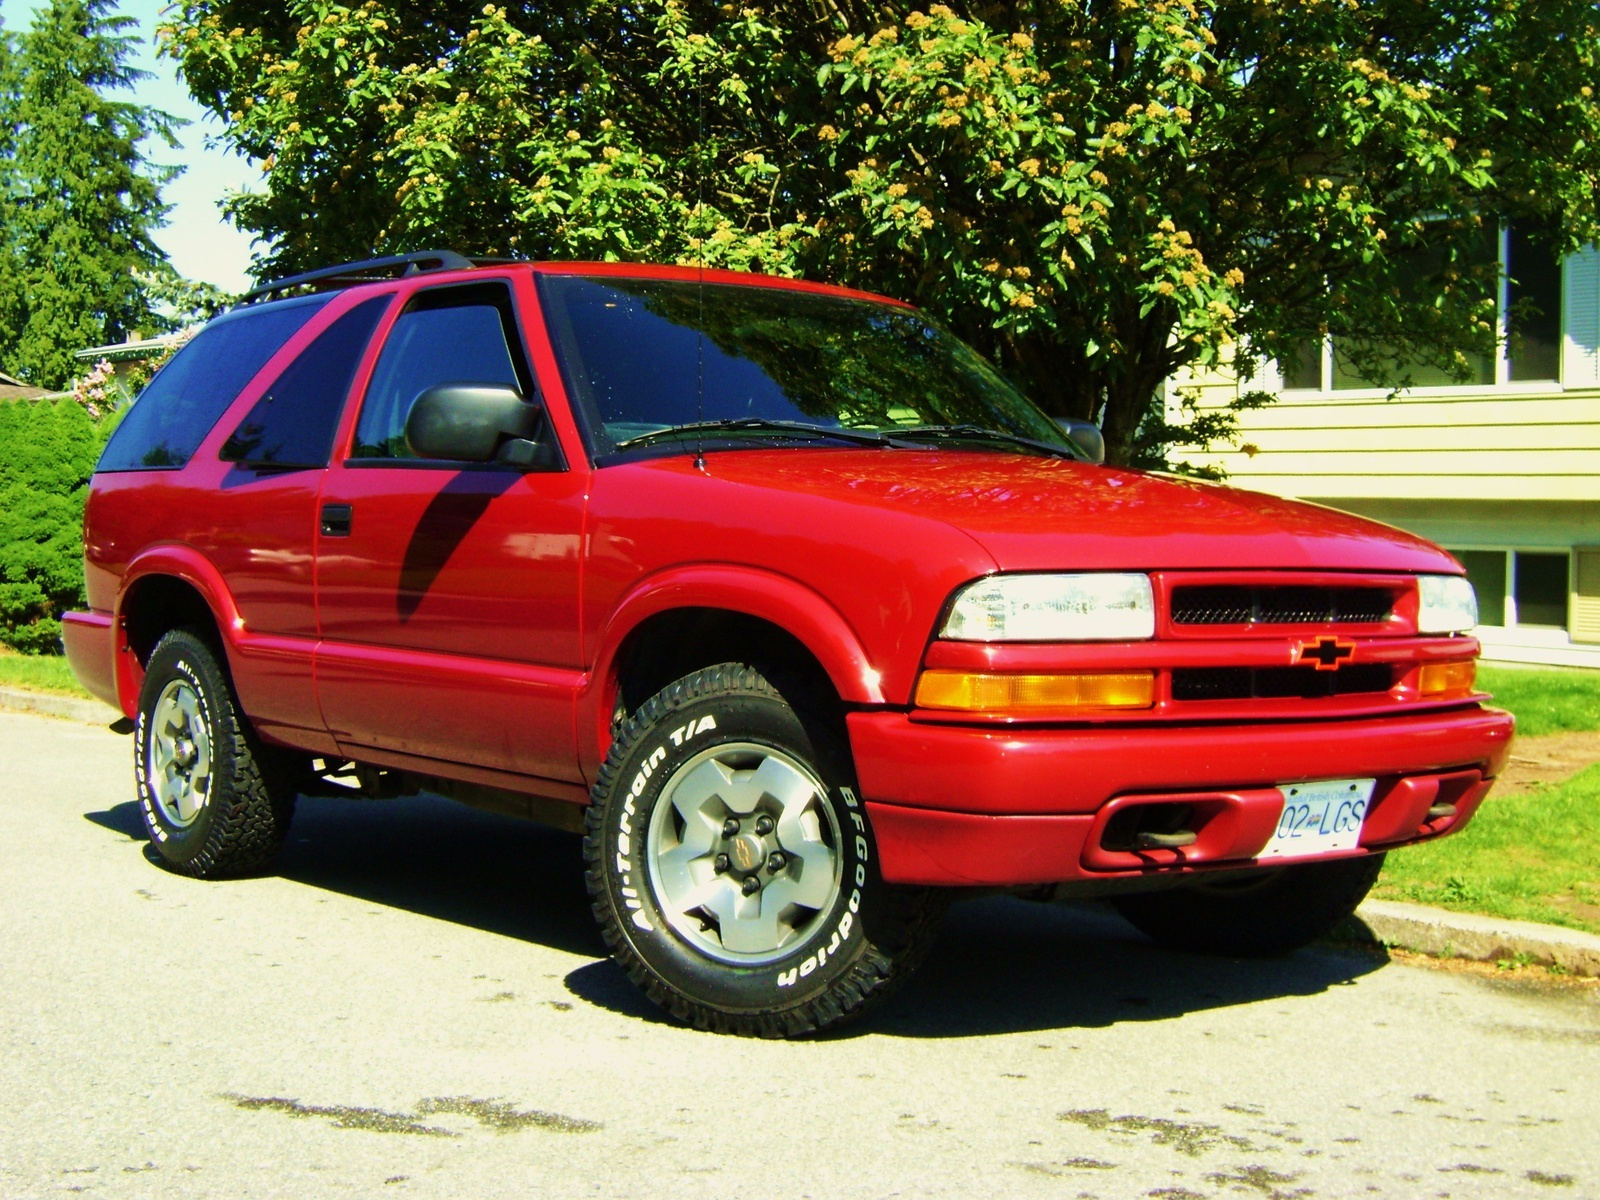 2005 Chevrolet Blazer - Overview - CarGurus